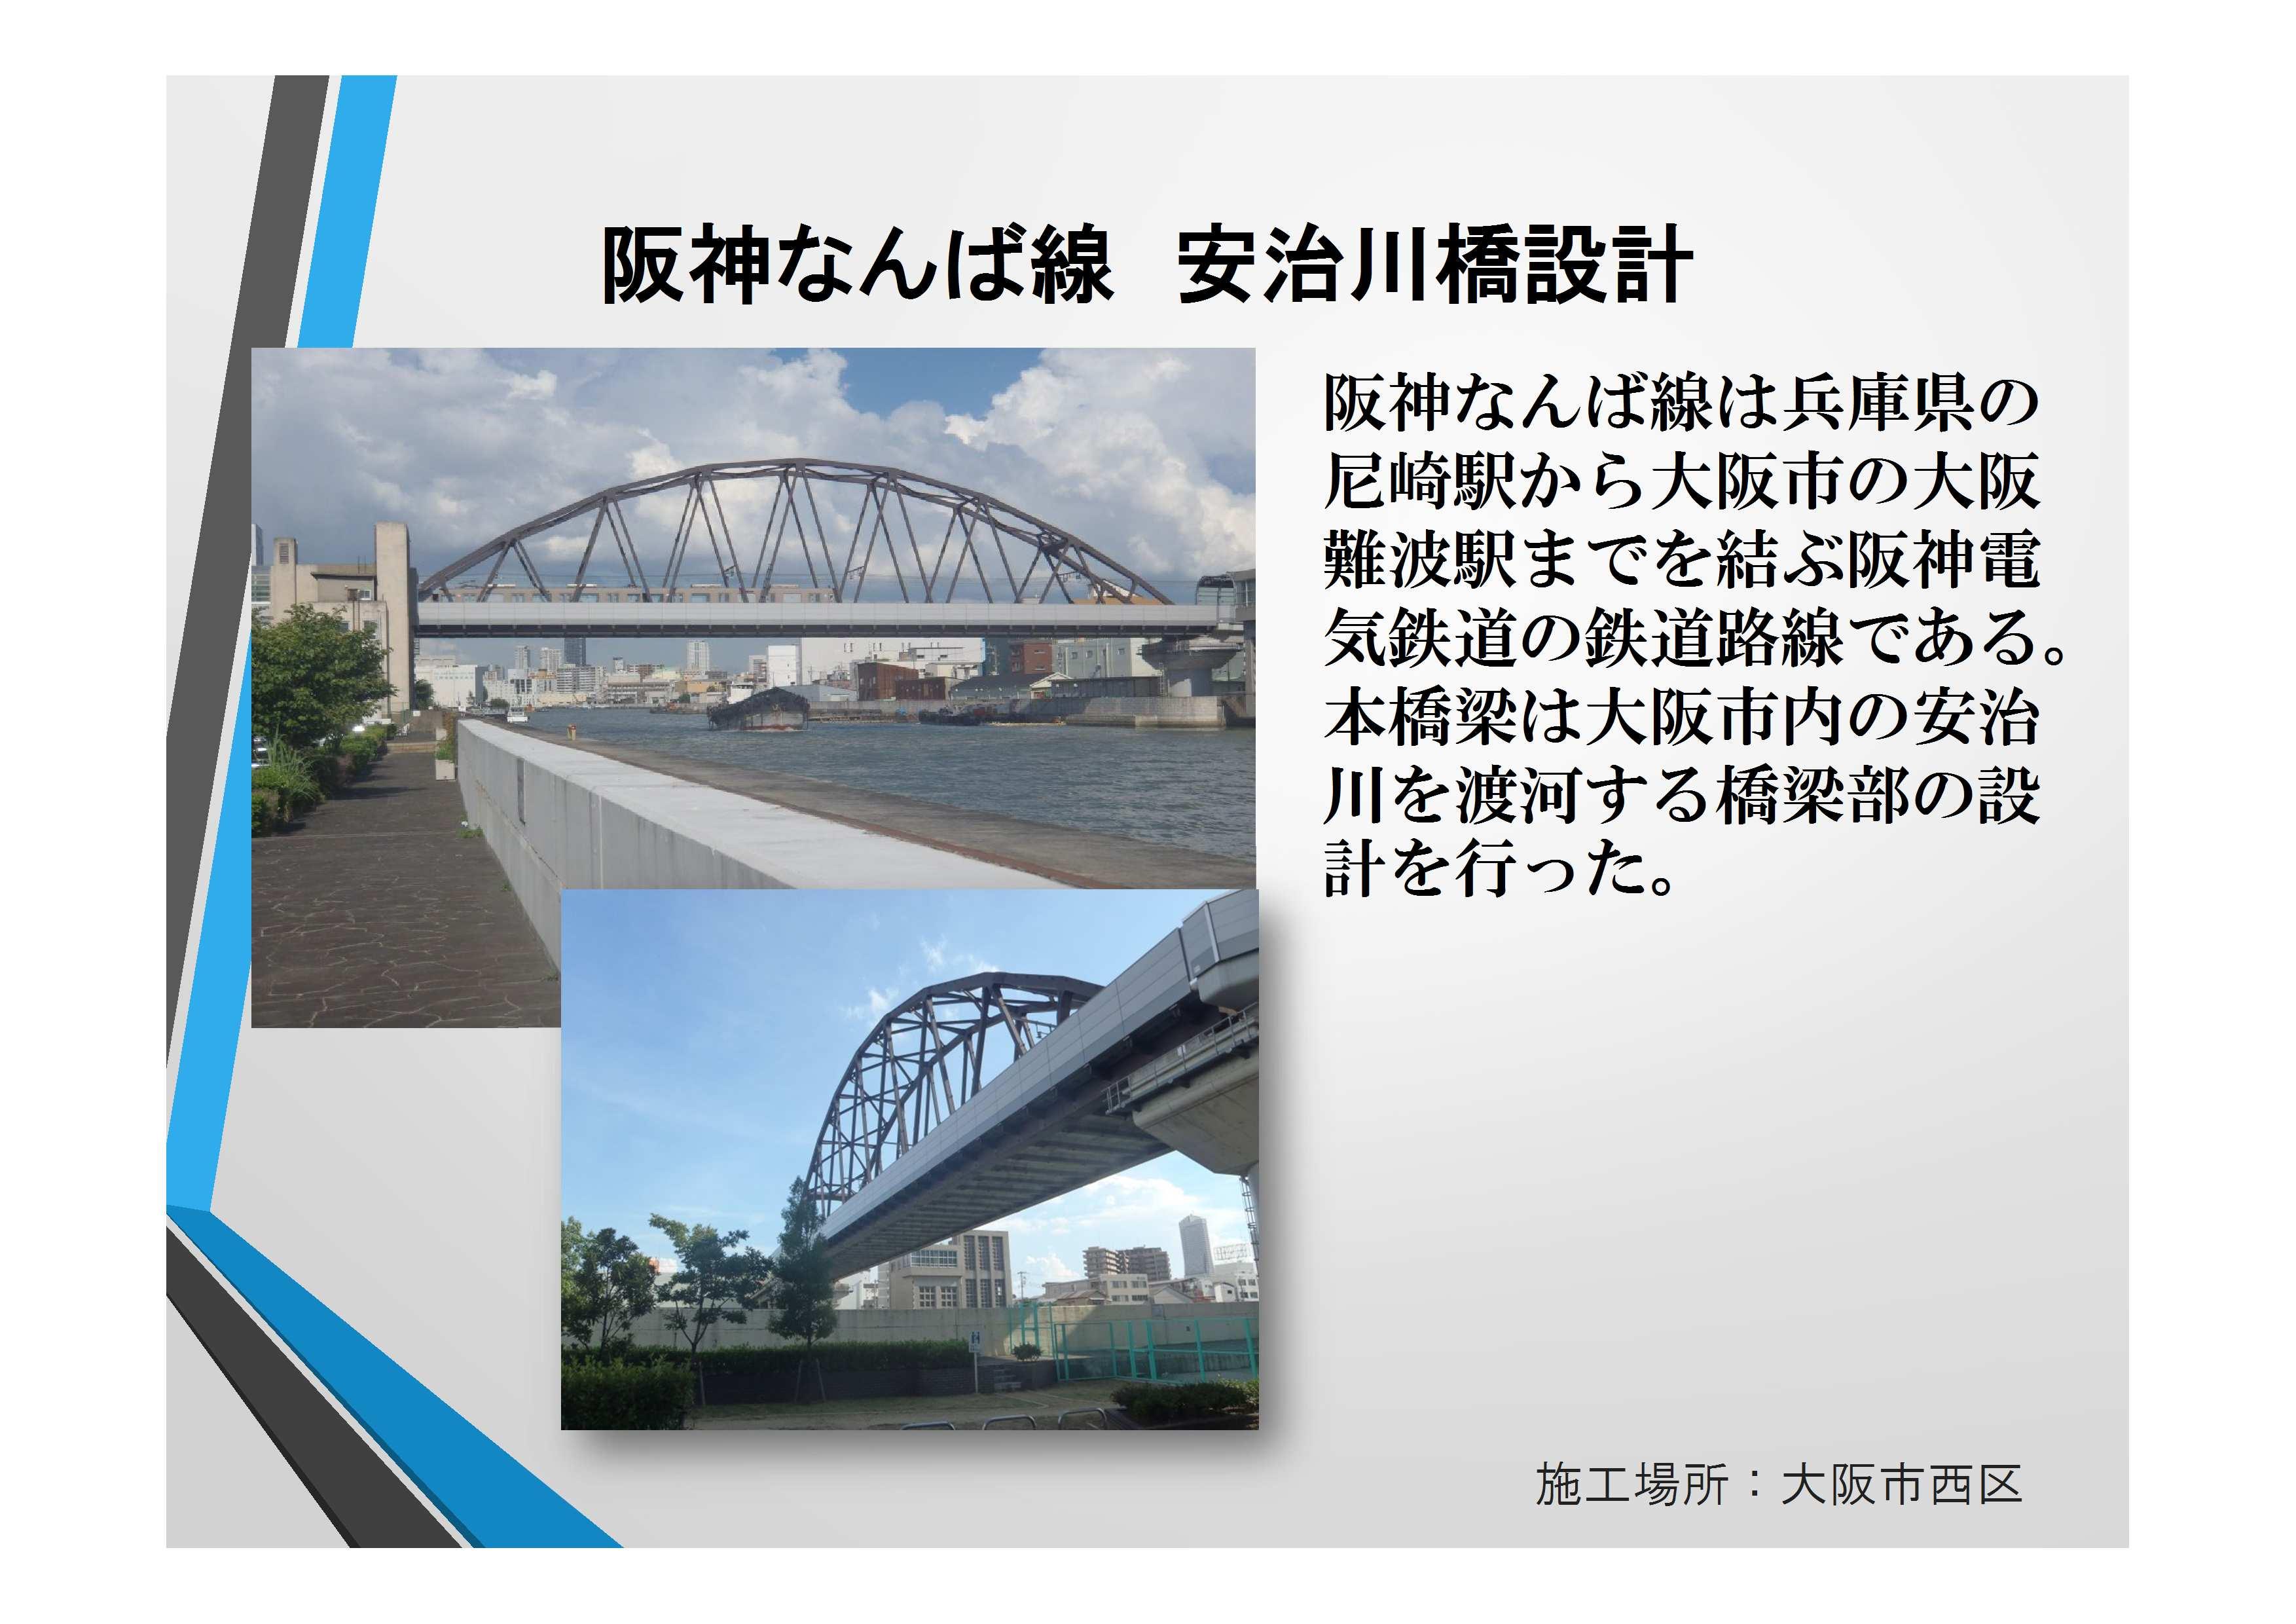 近17099 阪神なんば線 安治川橋設計【確認済】宮下部長